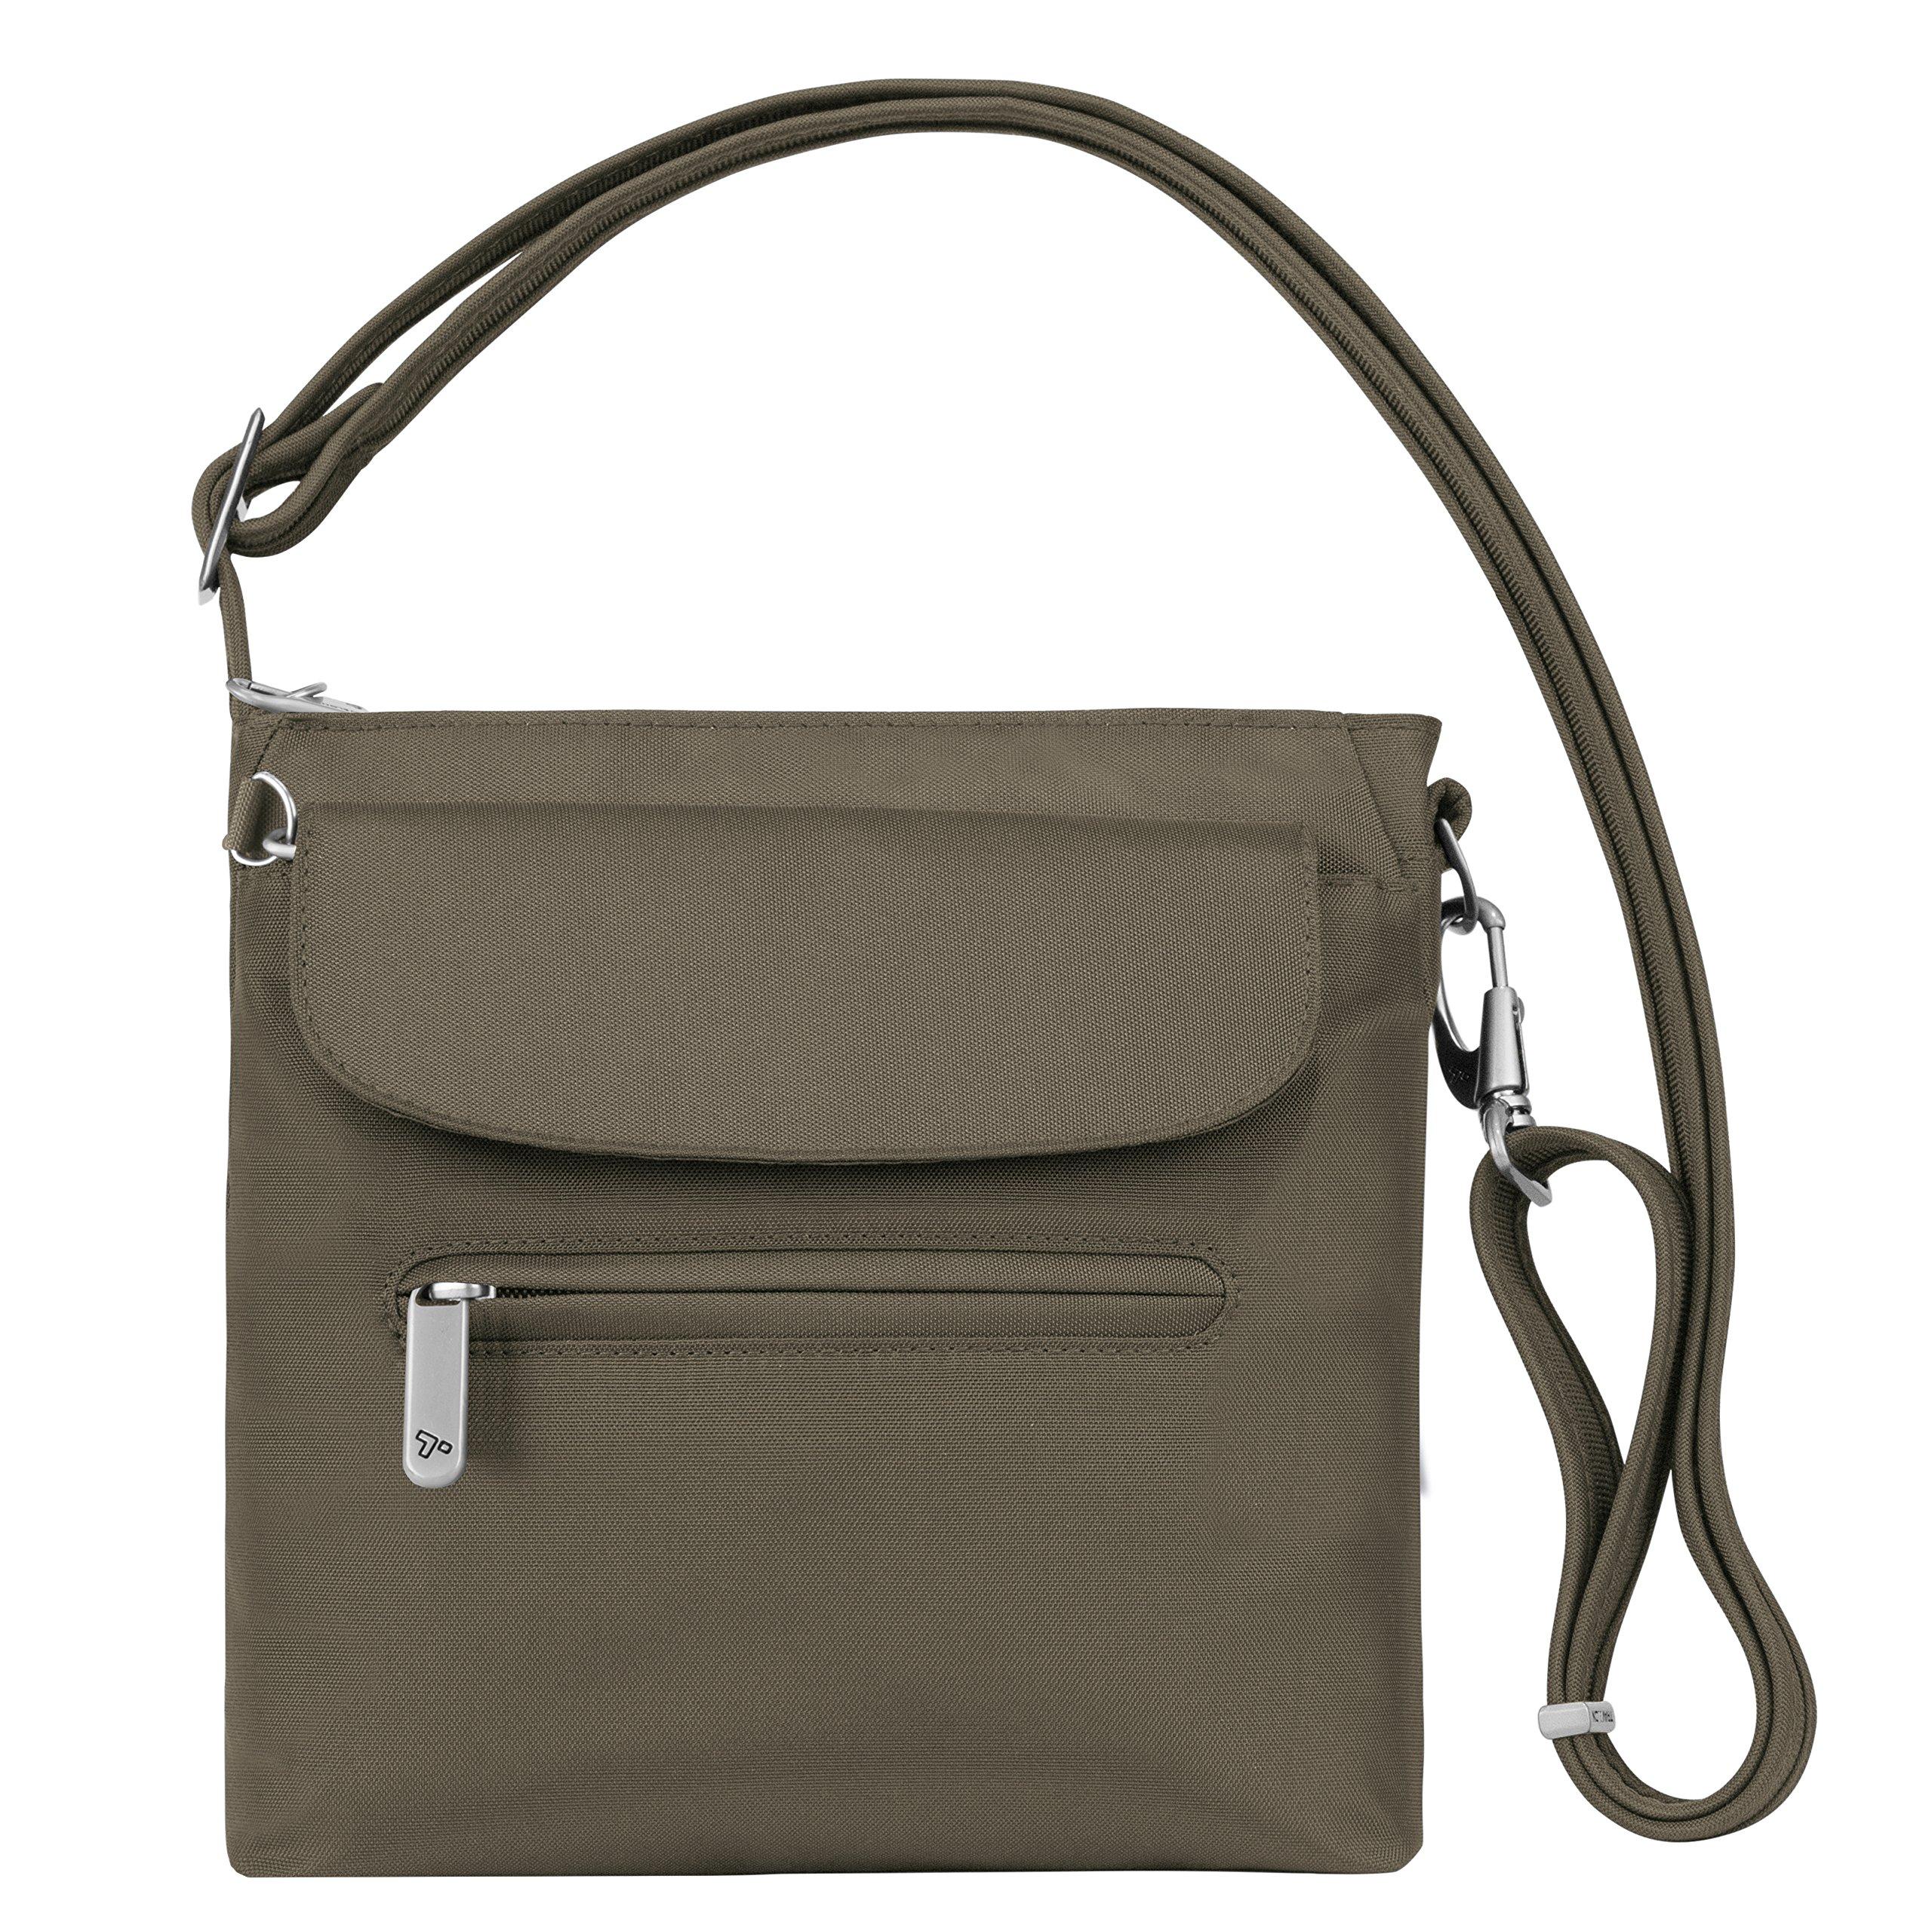 Travelon Women's Anti-theft Classic Mini Shoulder Bag Sling Tote, Nutmeg by Travelon (Image #1)